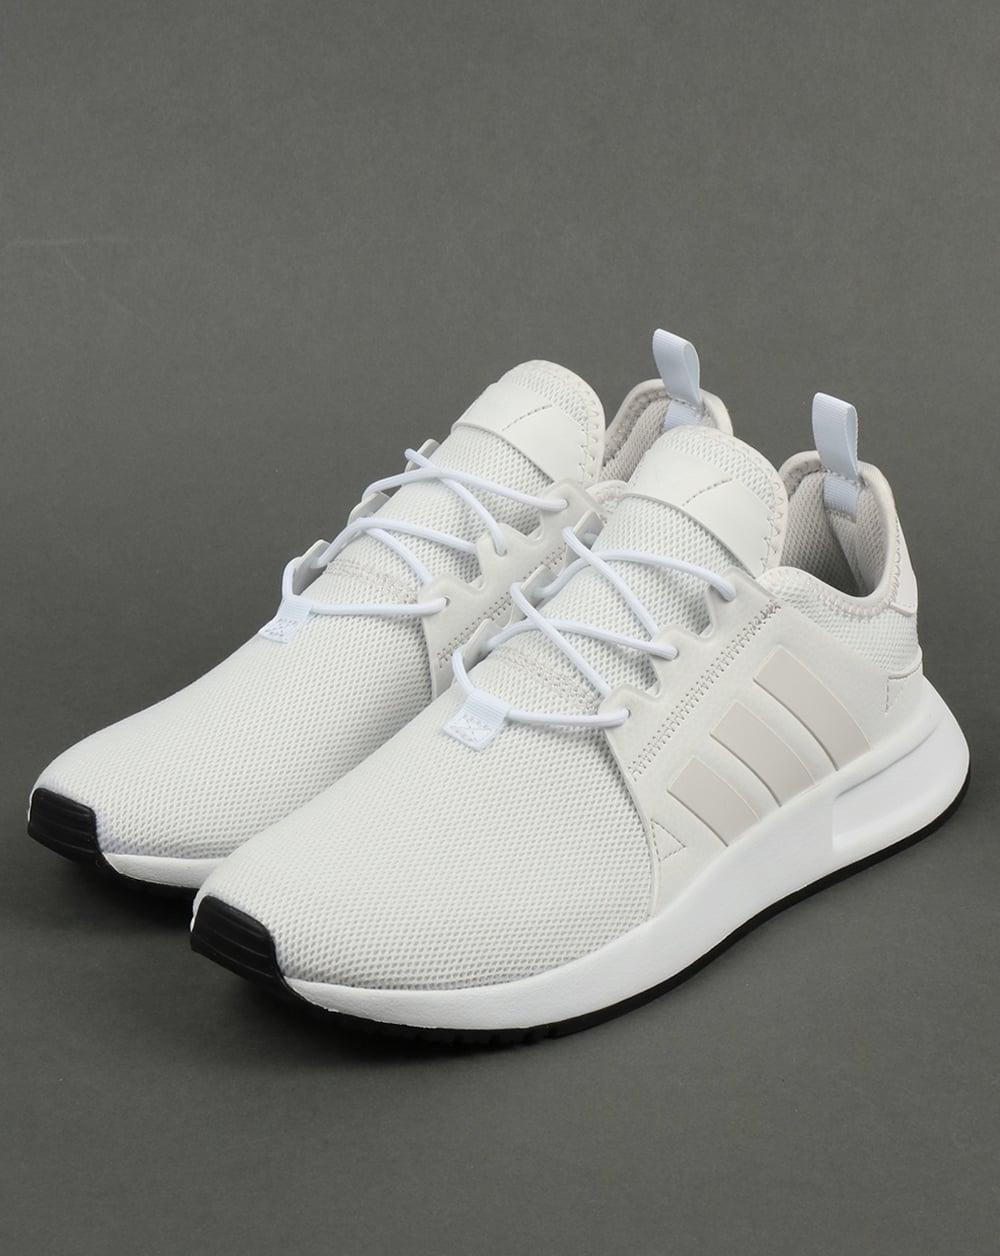 042f345f2089e Adidas XPLR Trainers Vintage White